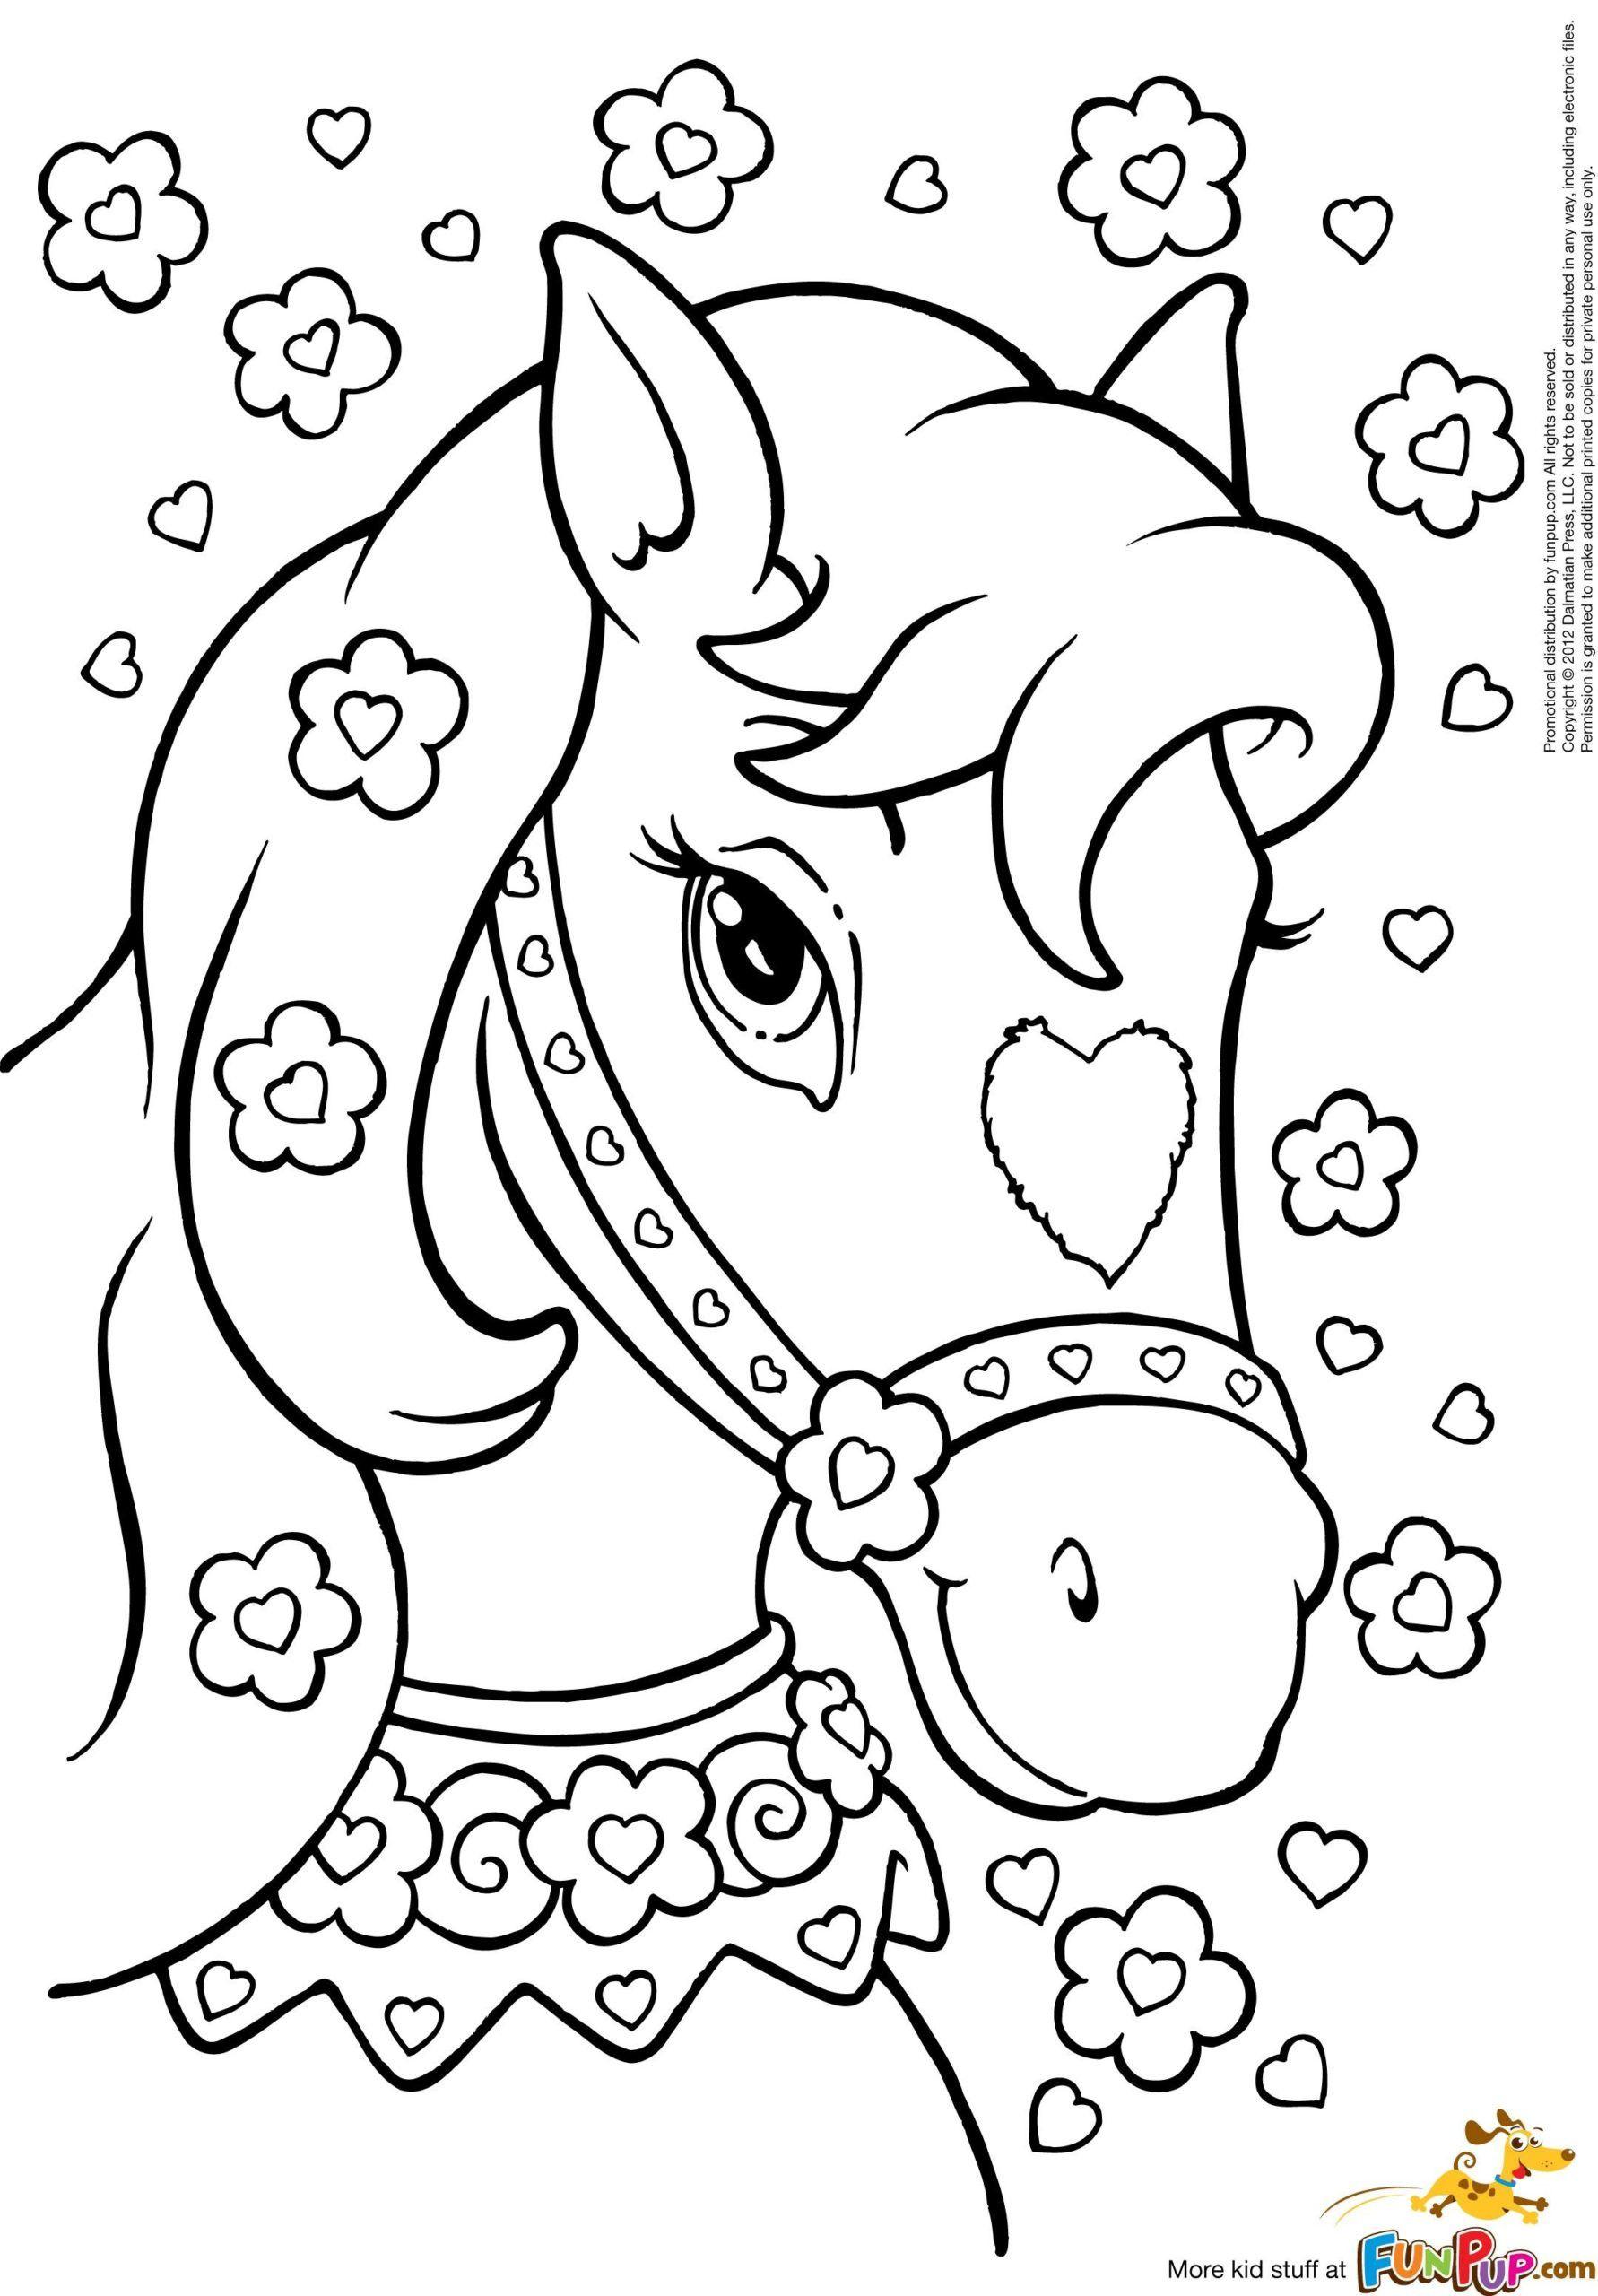 Princess Unicorn Coloring Page Youngandtae Com Unicorn Coloring Pages Disney Princess Coloring Pages Kids Printable Coloring Pages